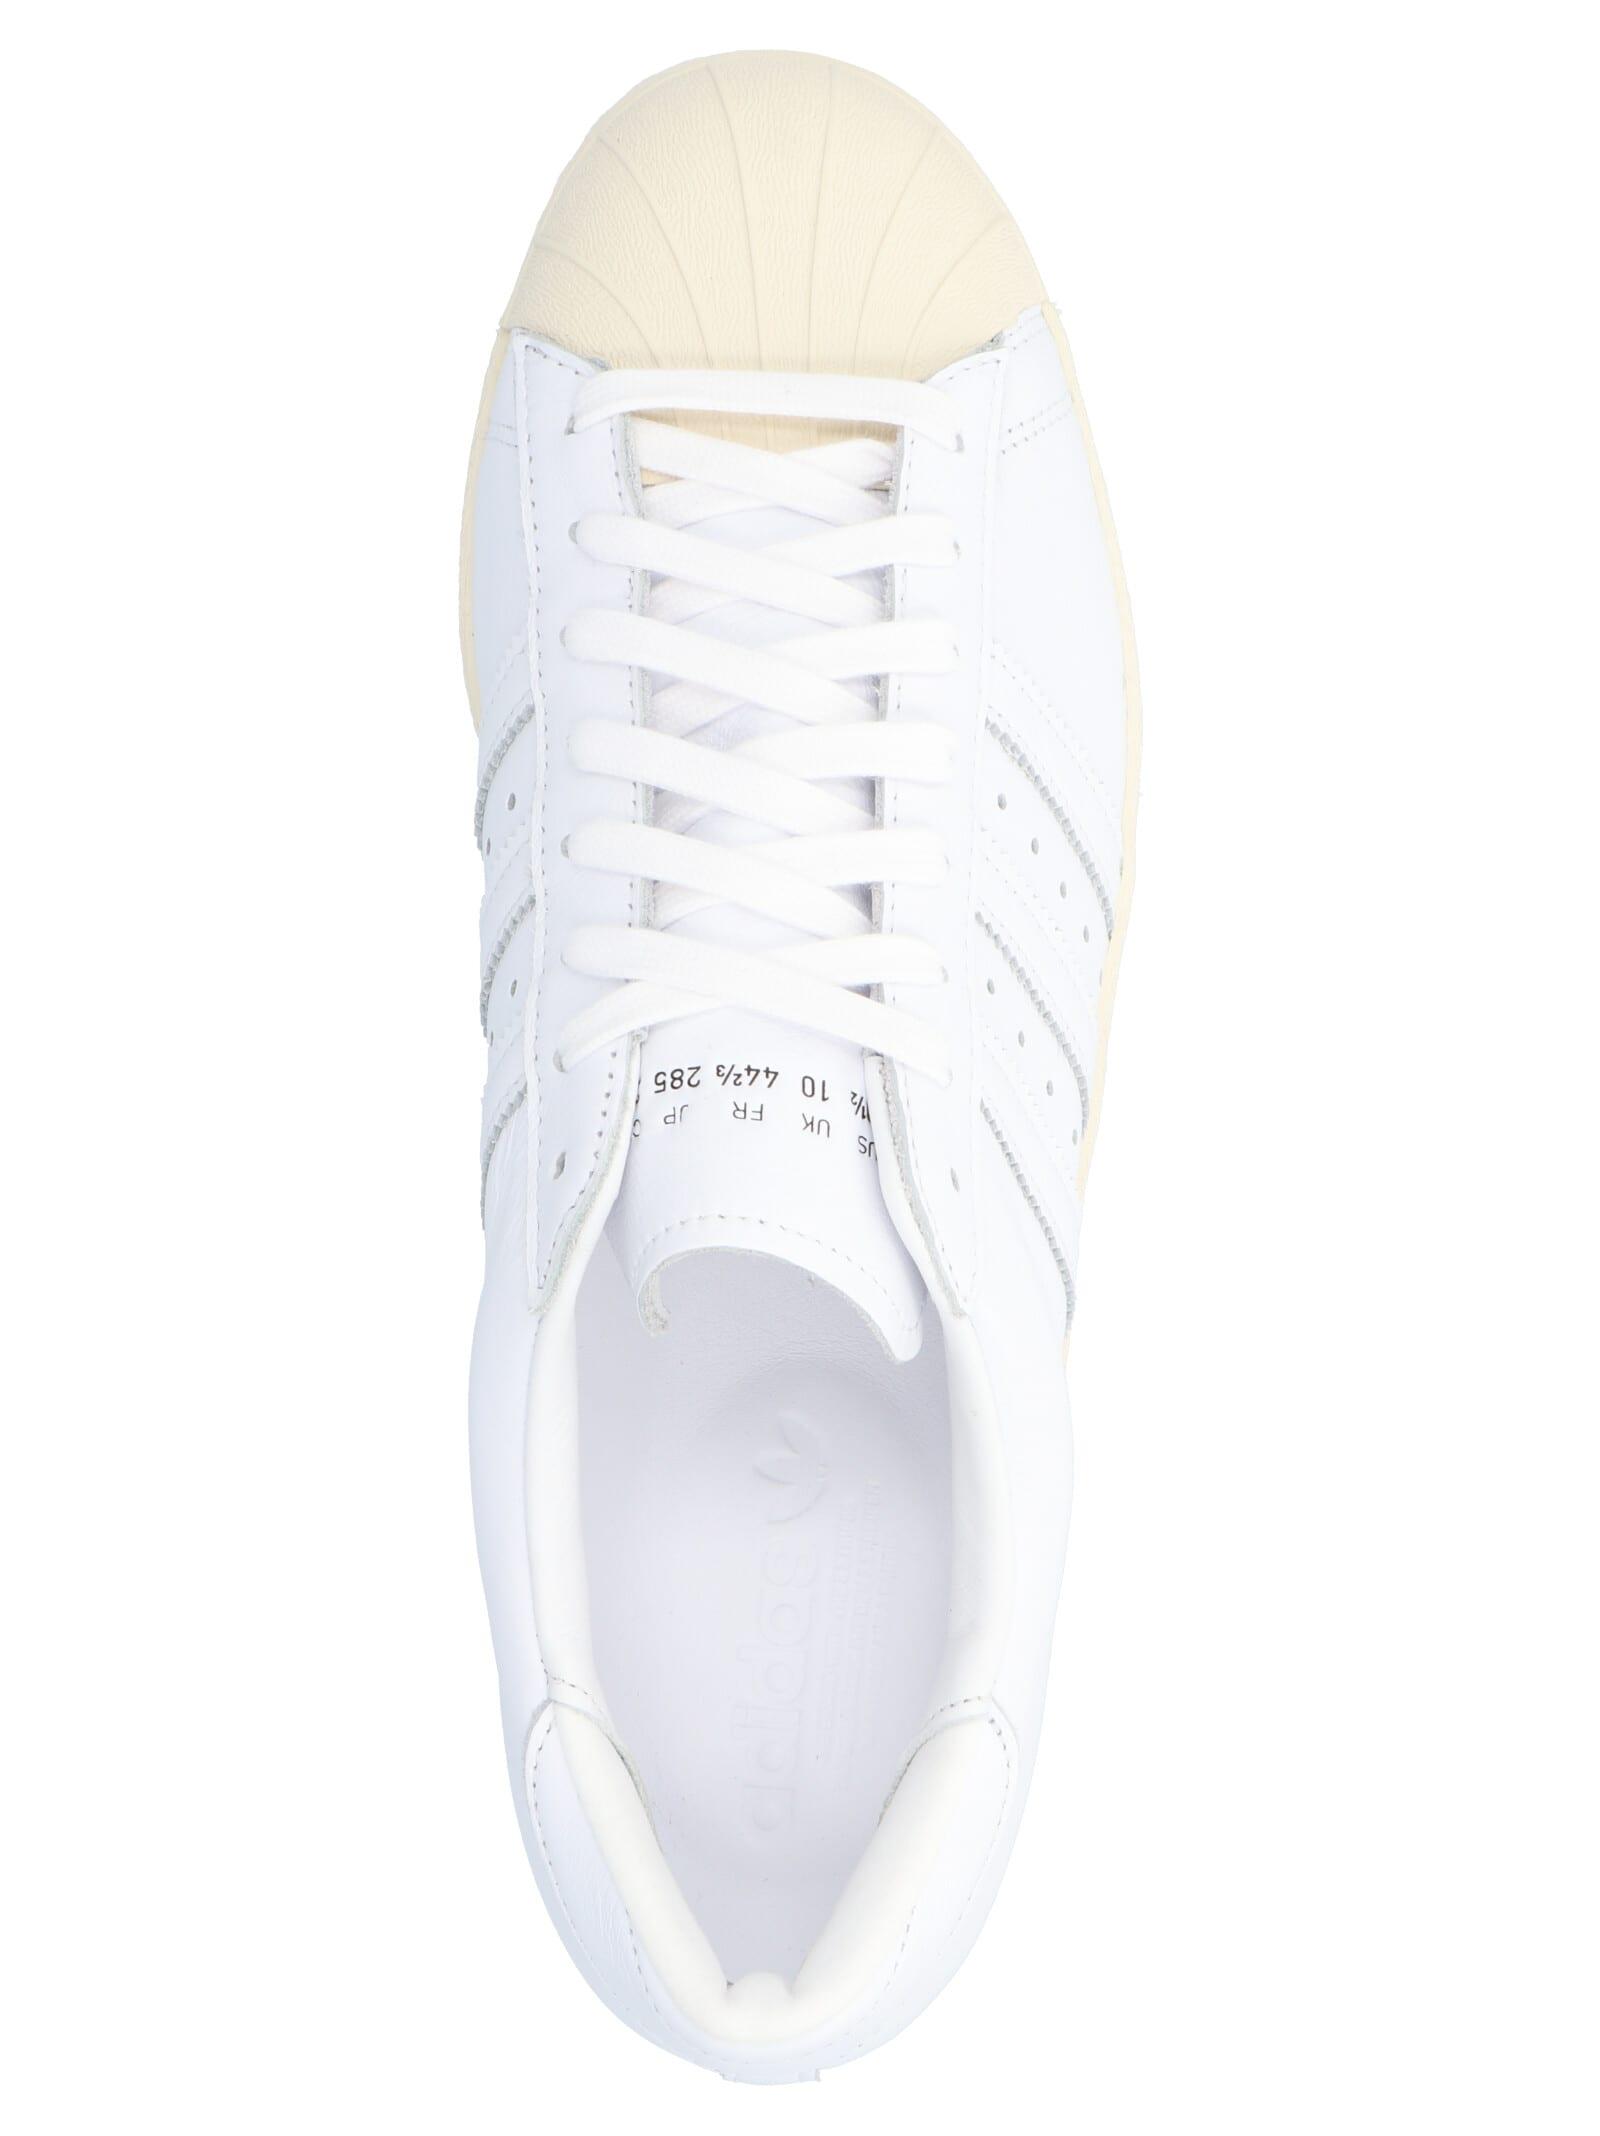 Best price on the market at italist | Adidas Originals Adidas Originals 'superstar 80s Recon' Shoes